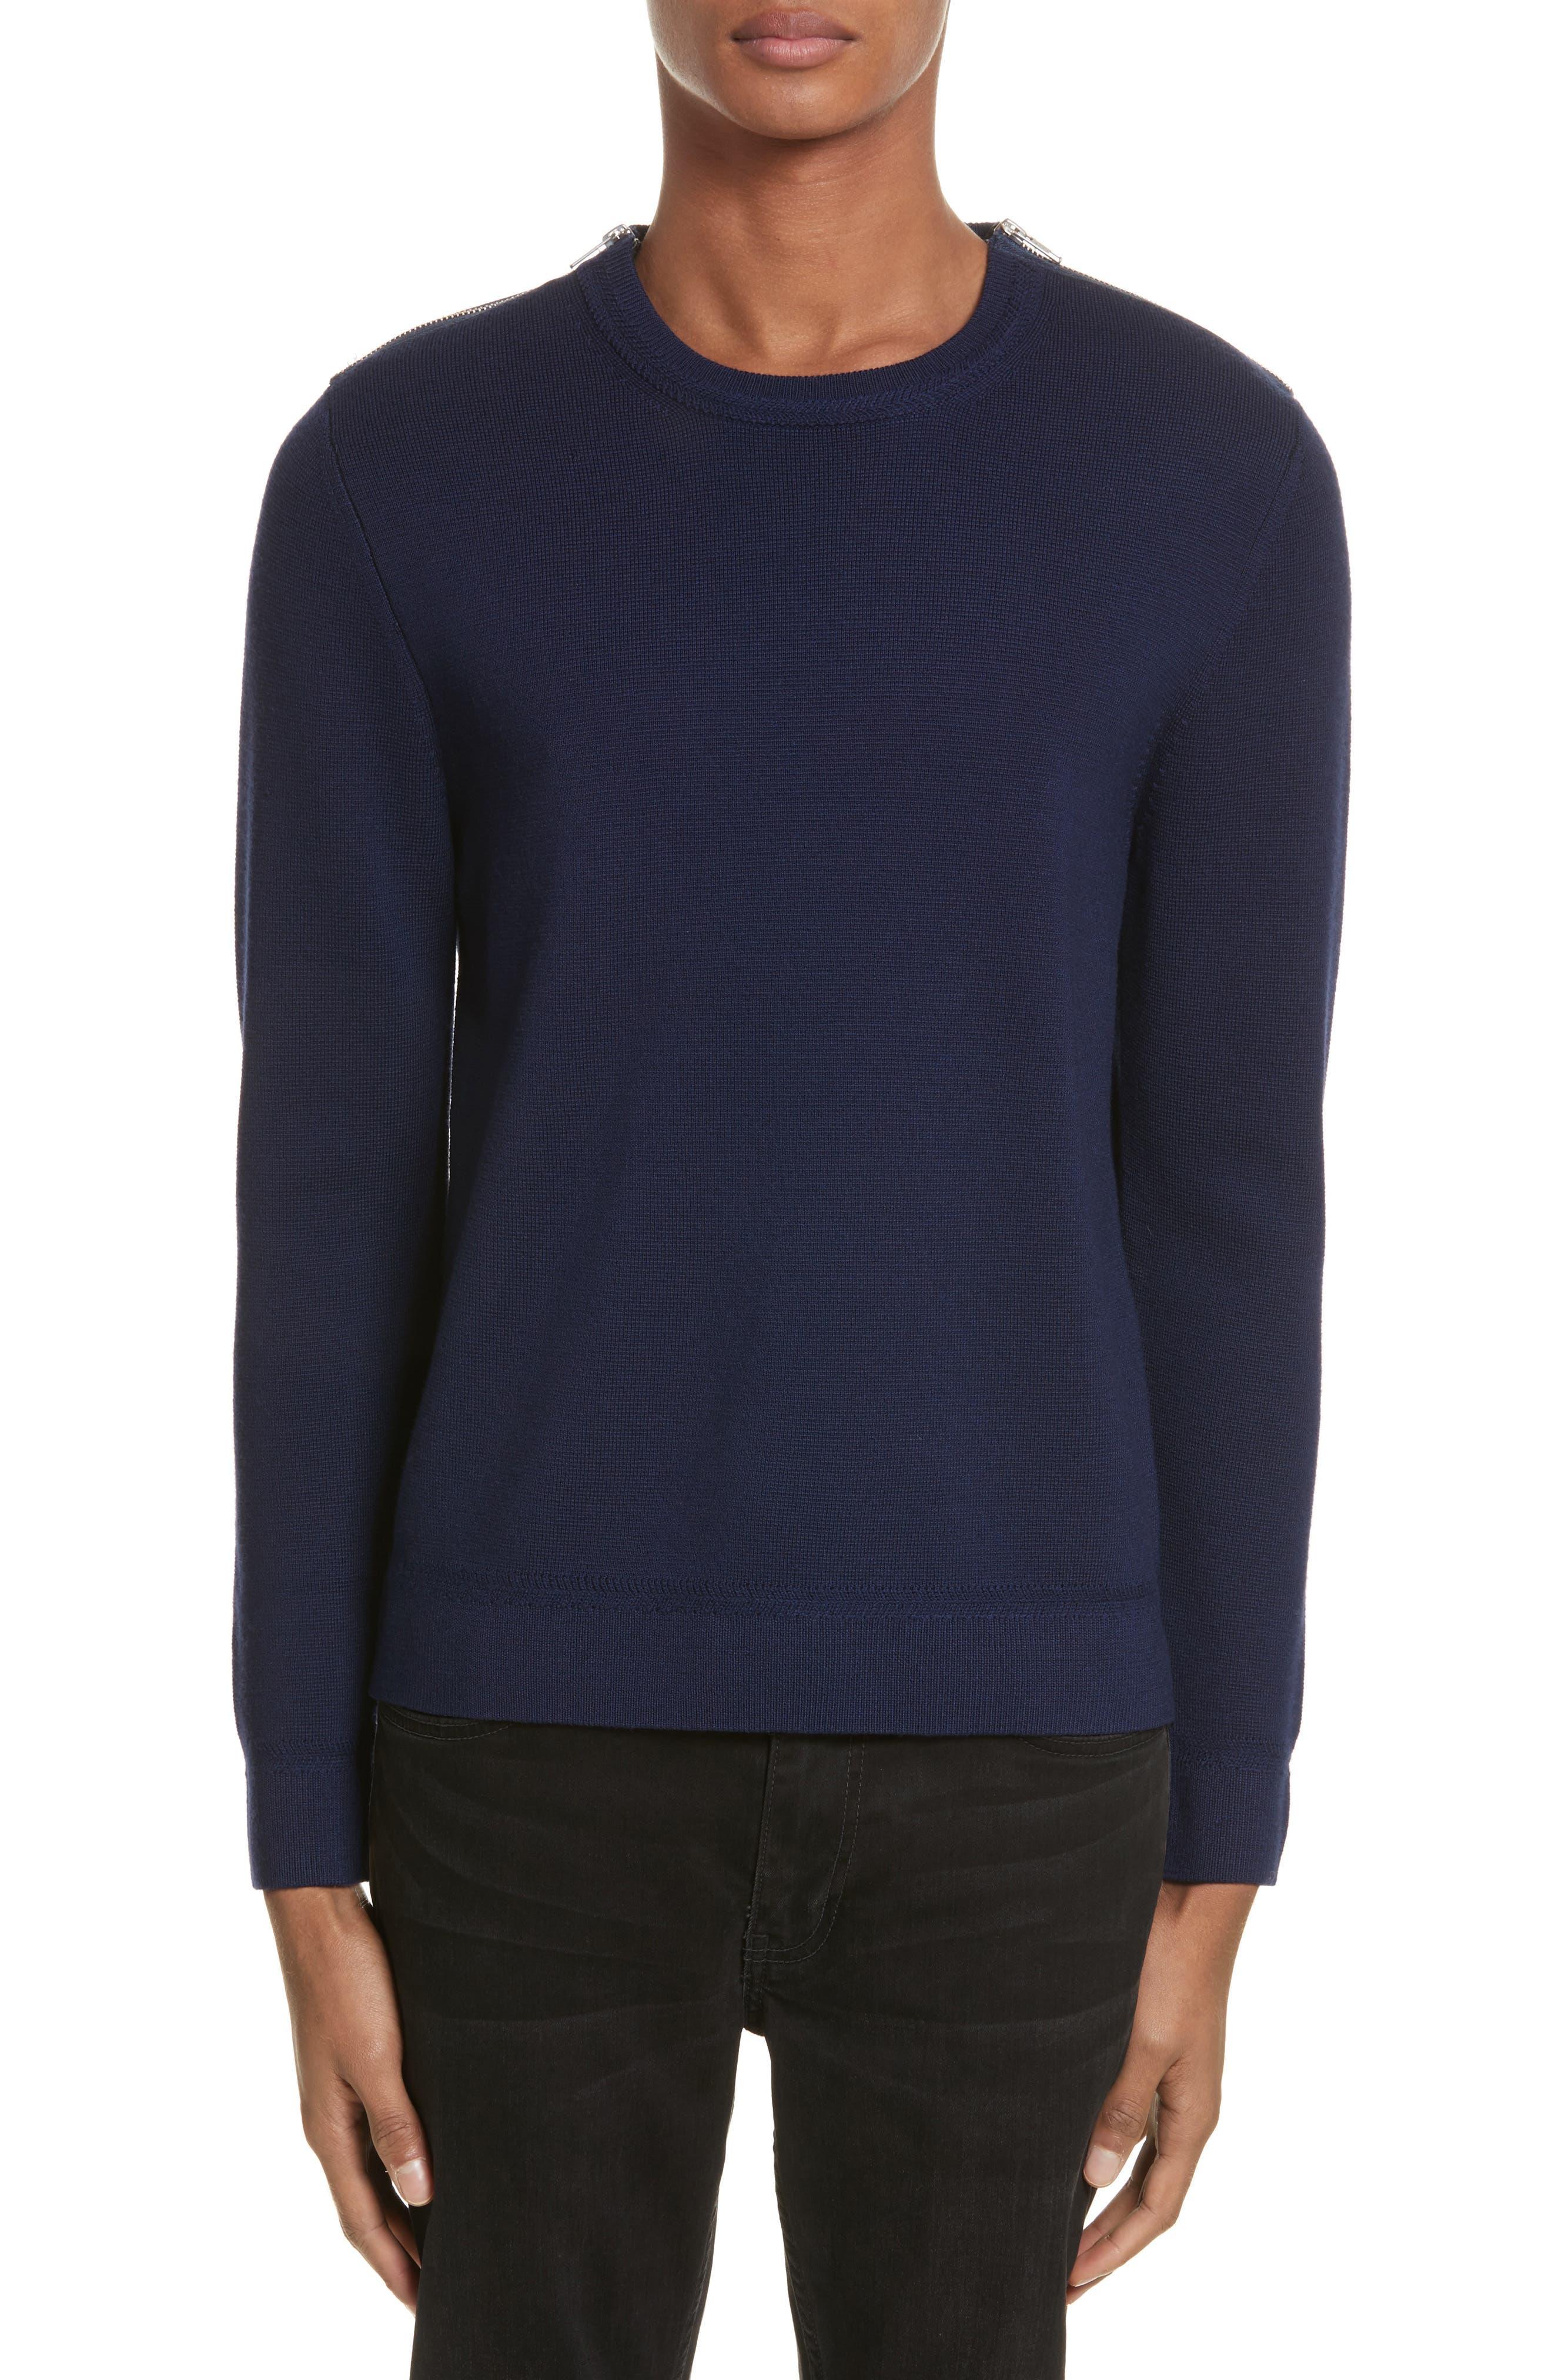 Merino Wool Blend Sweater with Shoulder Zip Trim,                         Main,                         color, Navy